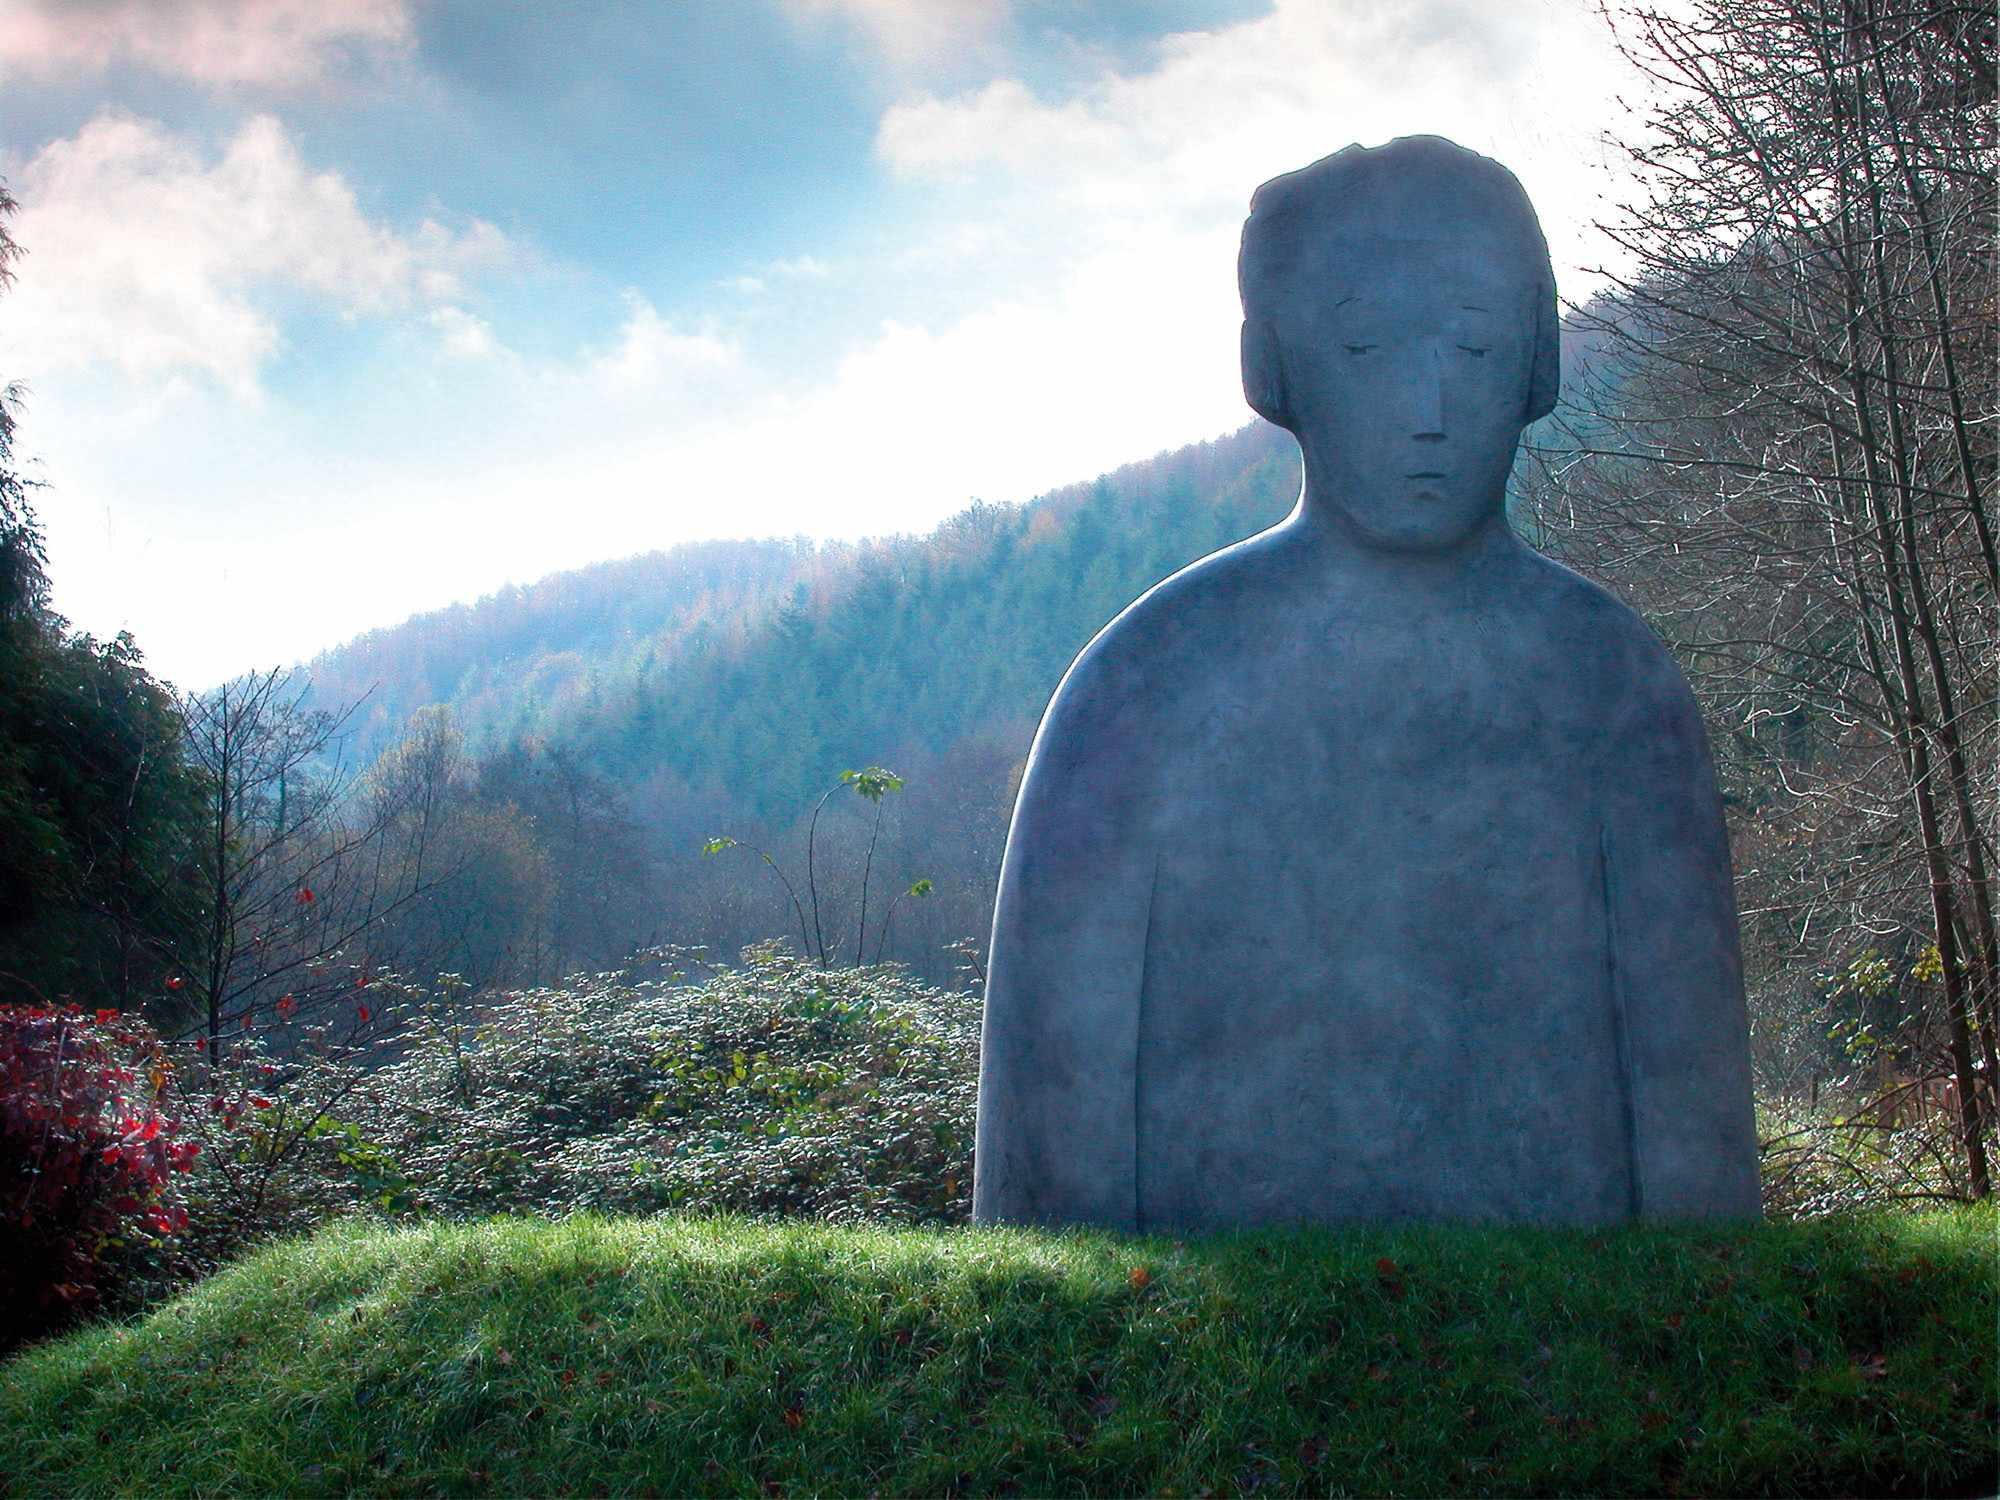 Broomhill Art Hotel & Sculpture Gardens